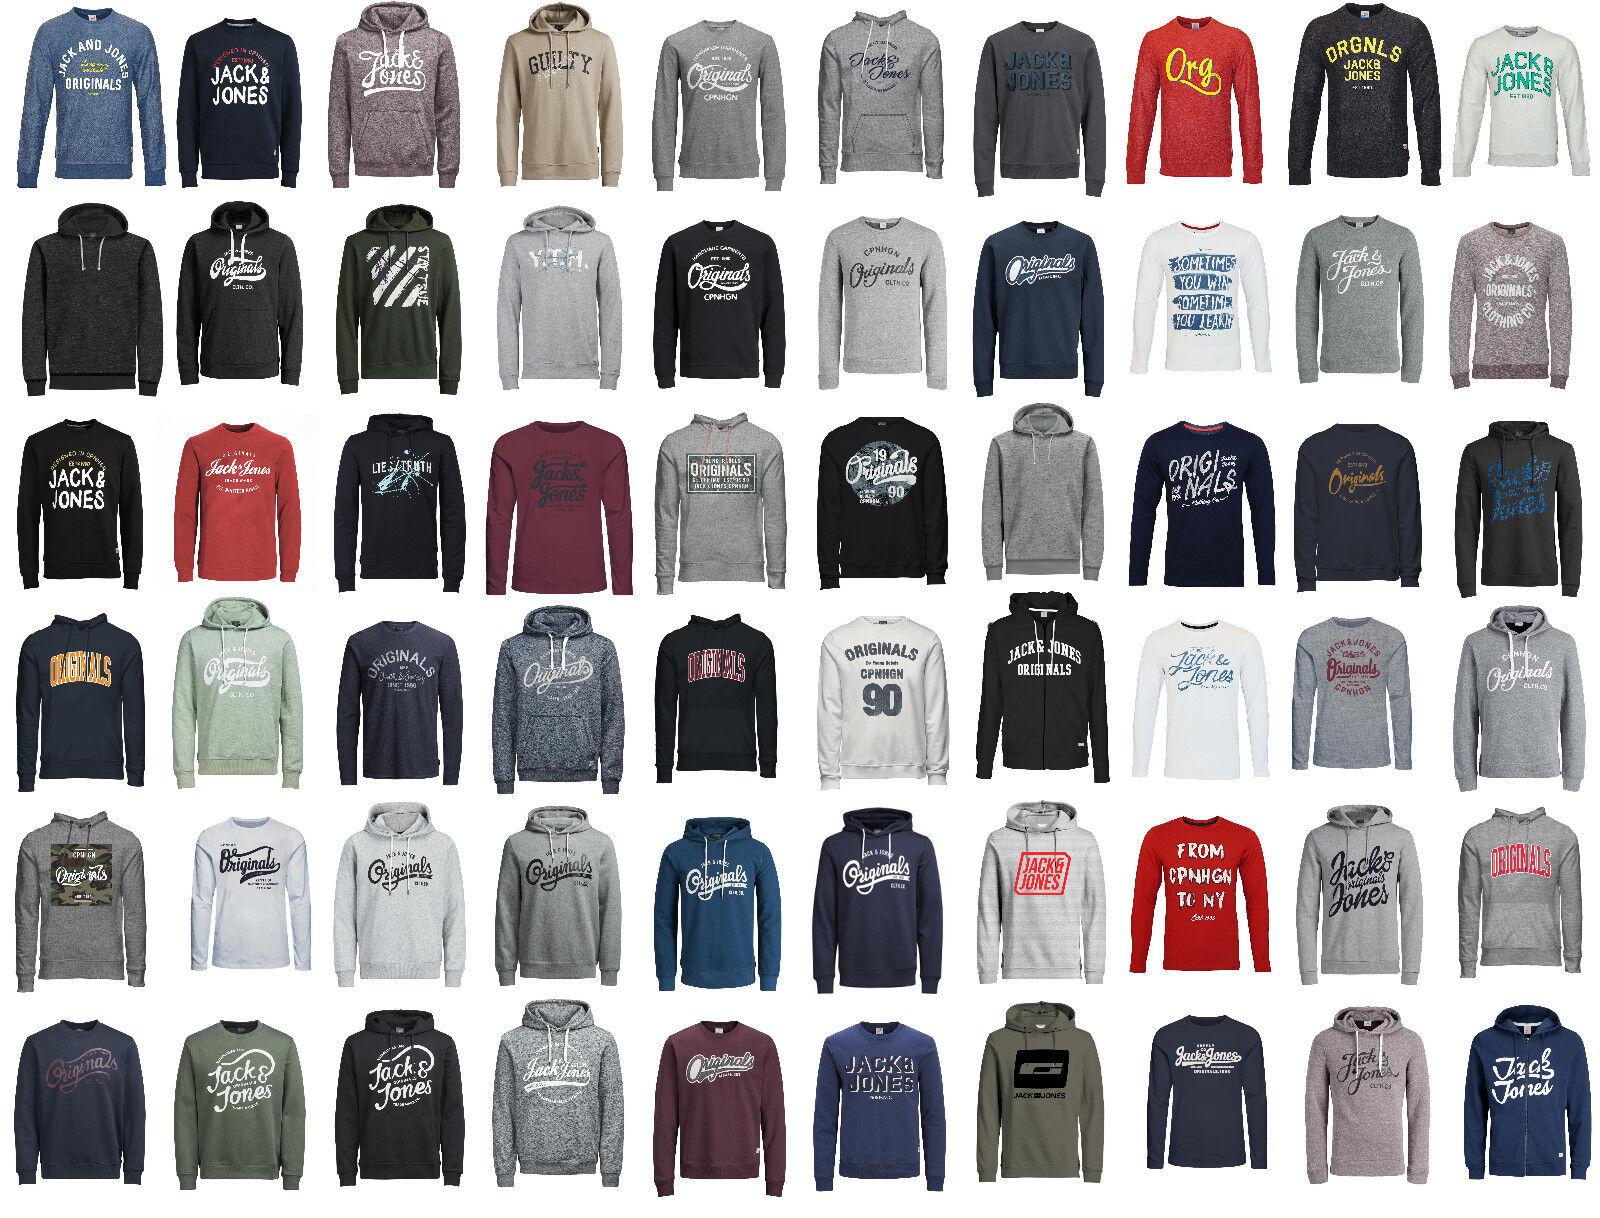 Jack & Jones Pullover Hoodies Jacken und Sweater vers Modelle & Farben